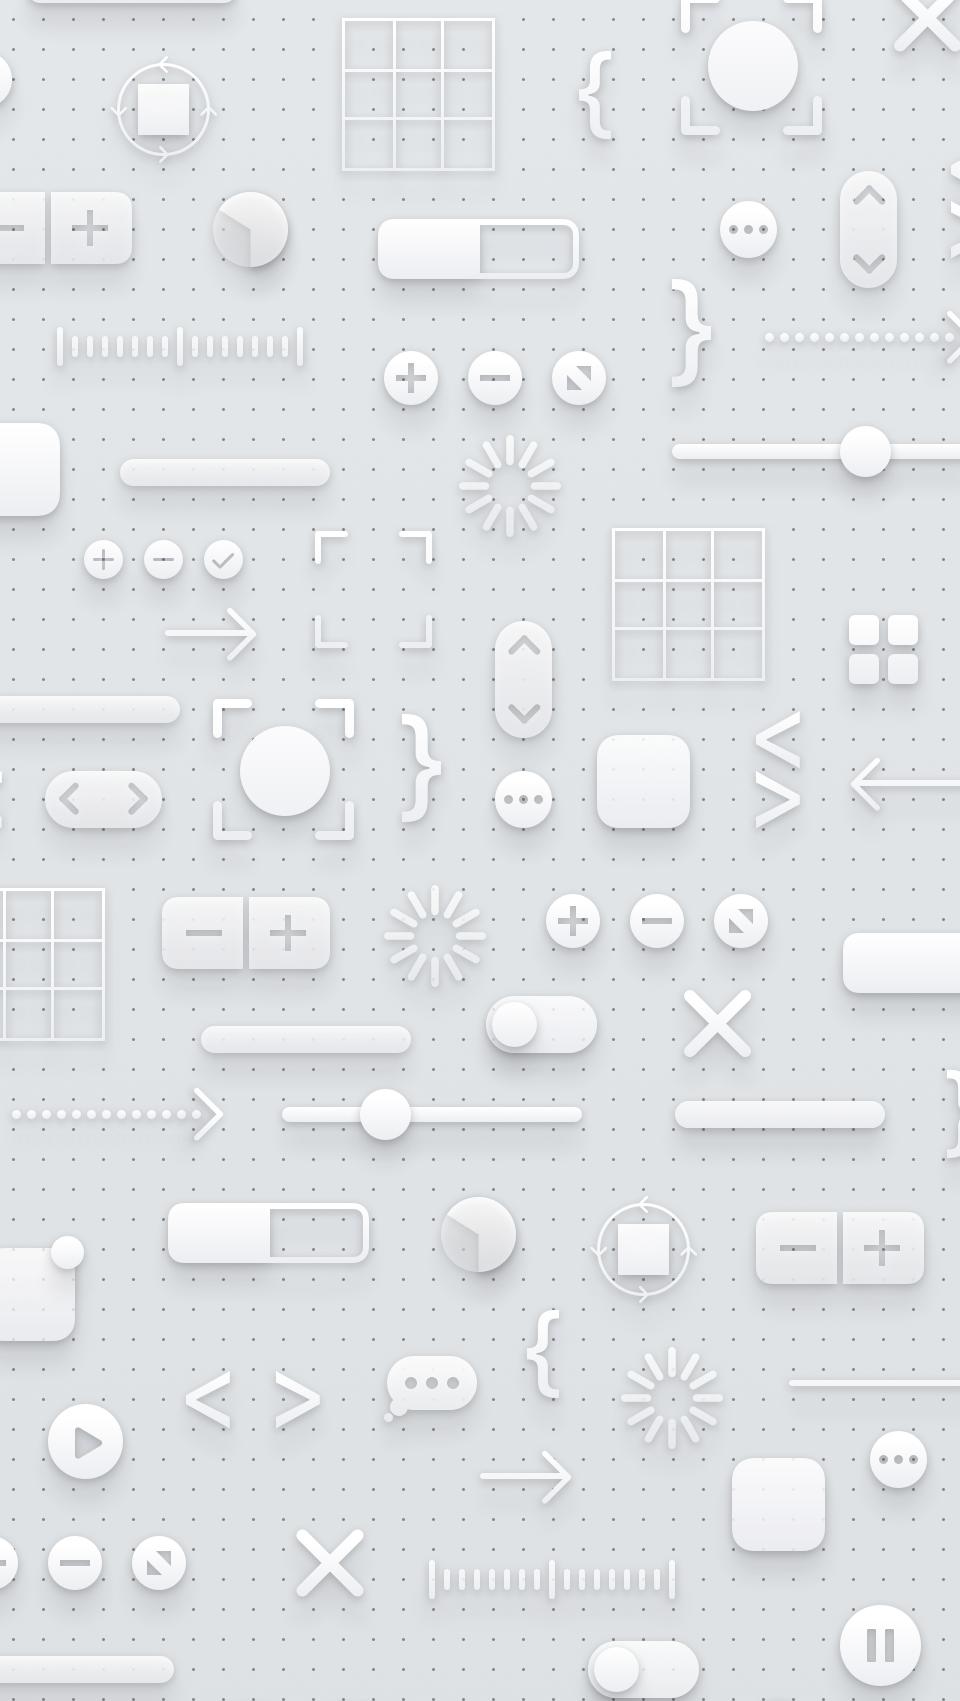 WWDC 2018 wallpaper iPhone SE no logo